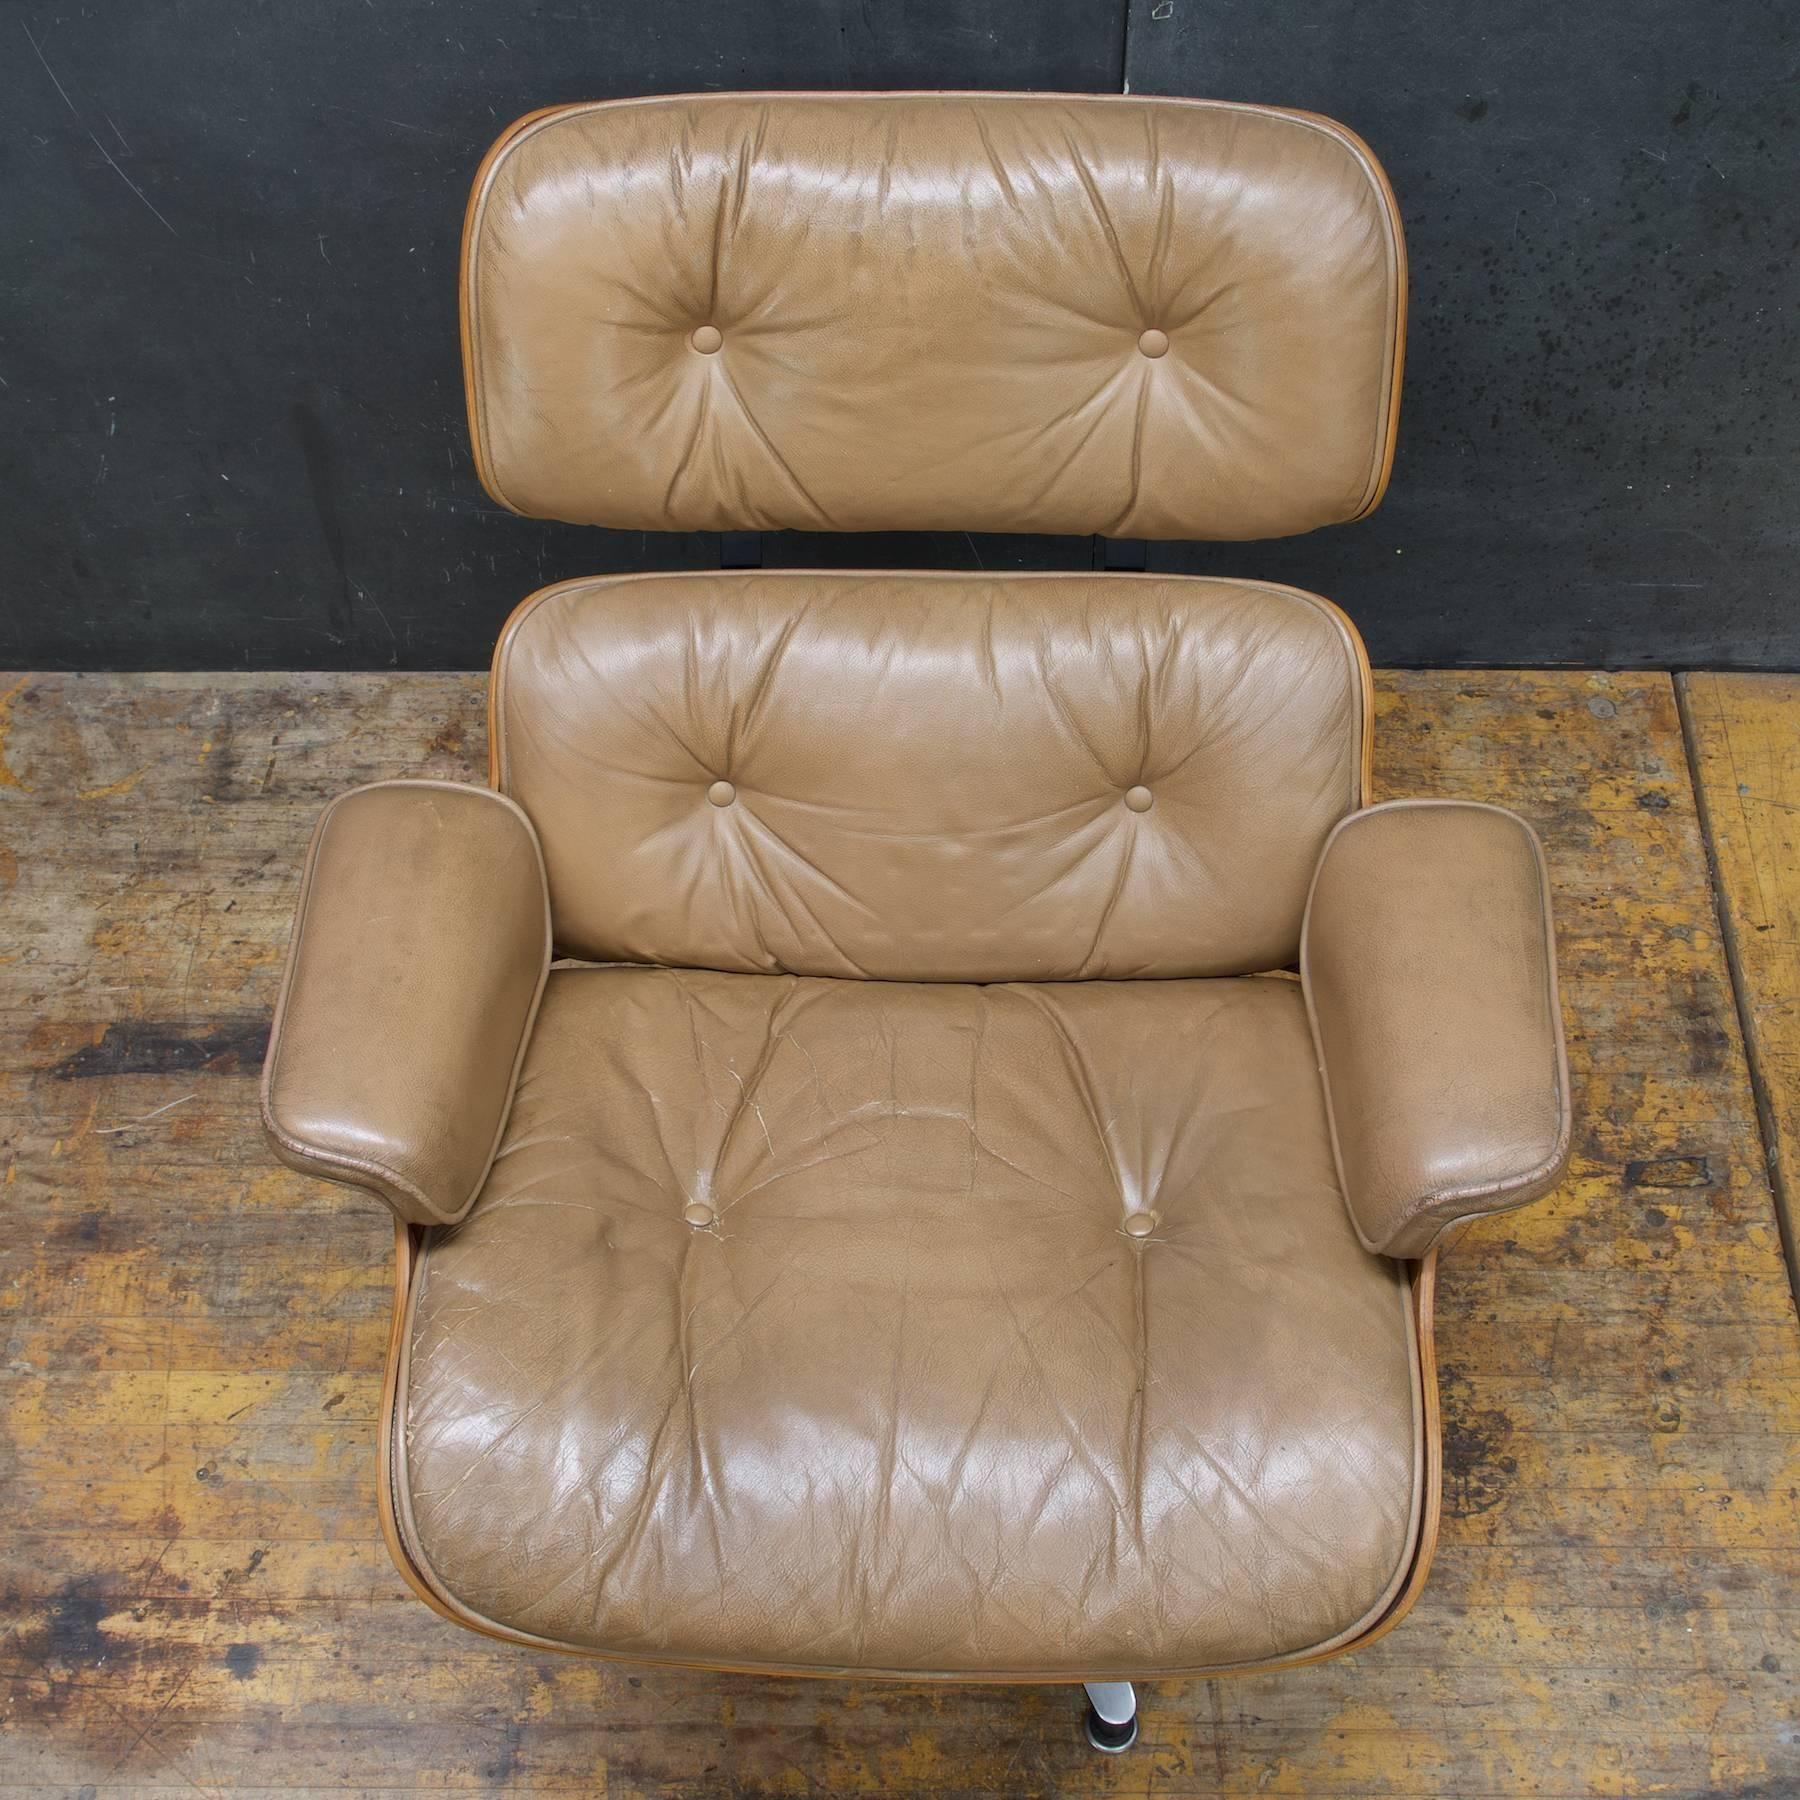 eames herman miller 670 lounge chair7 master